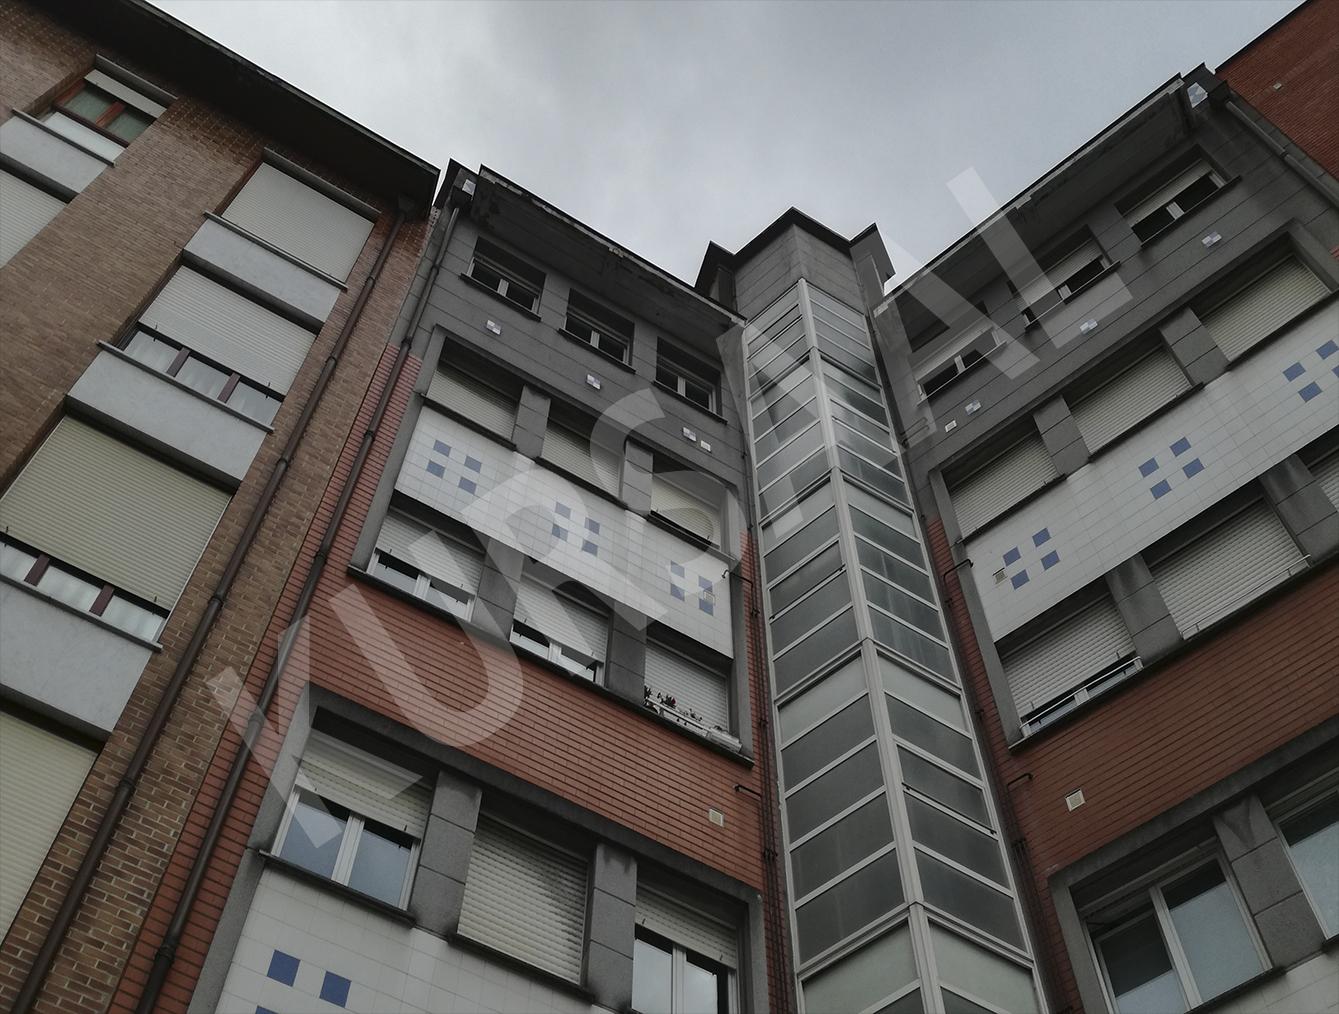 foto 11 - Restauración y patrimonio-Marcelino Soroa 5-DONOSTIA, GIPUZKOA